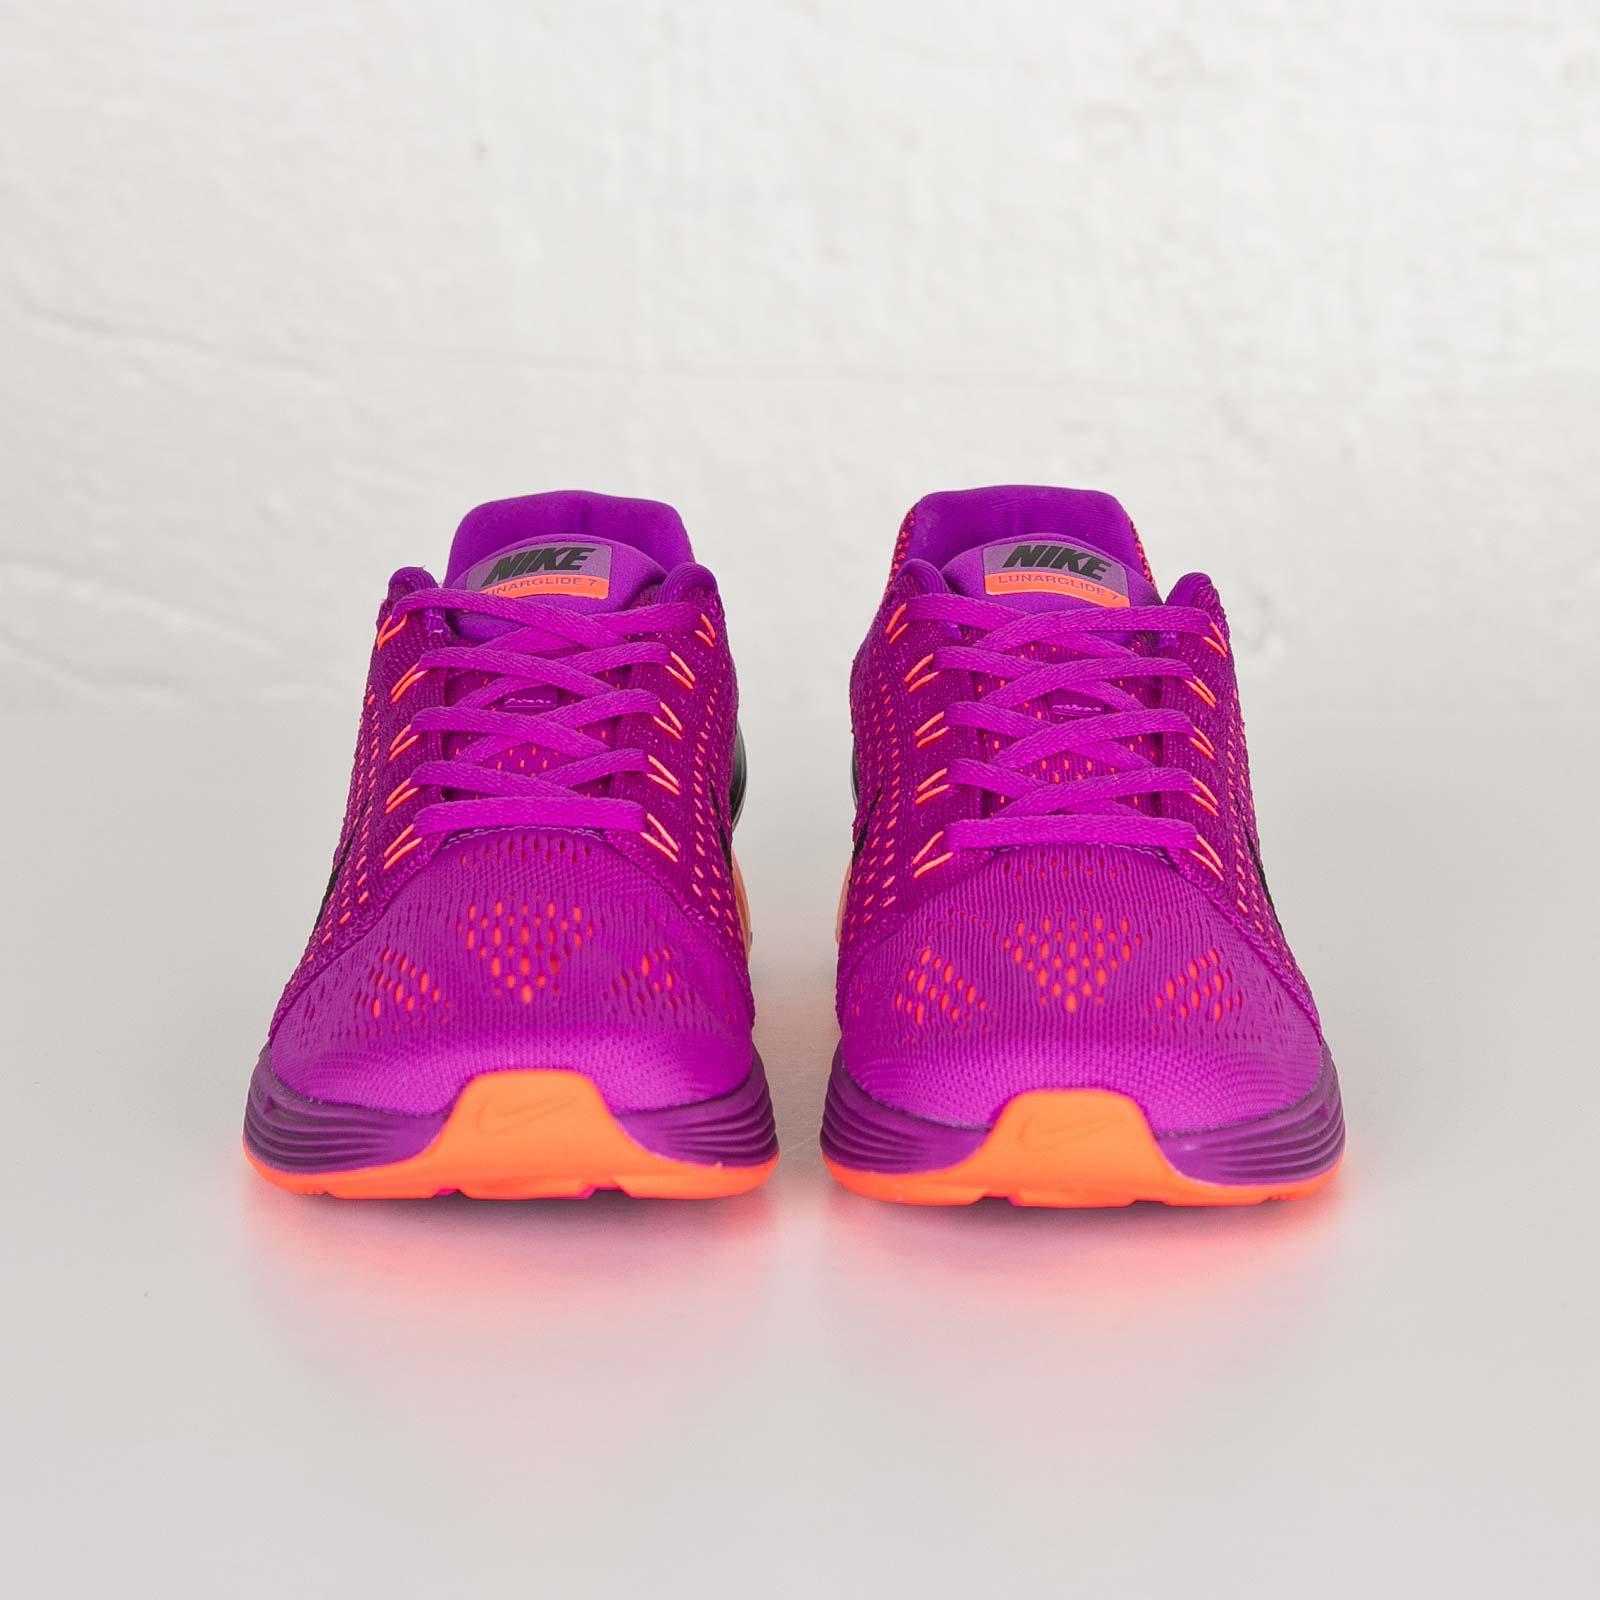 sports shoes 9db65 2bdb1 ... clearance nike wmns lunarglide 7 nike wmns lunarglide 7 bc43e 466d5